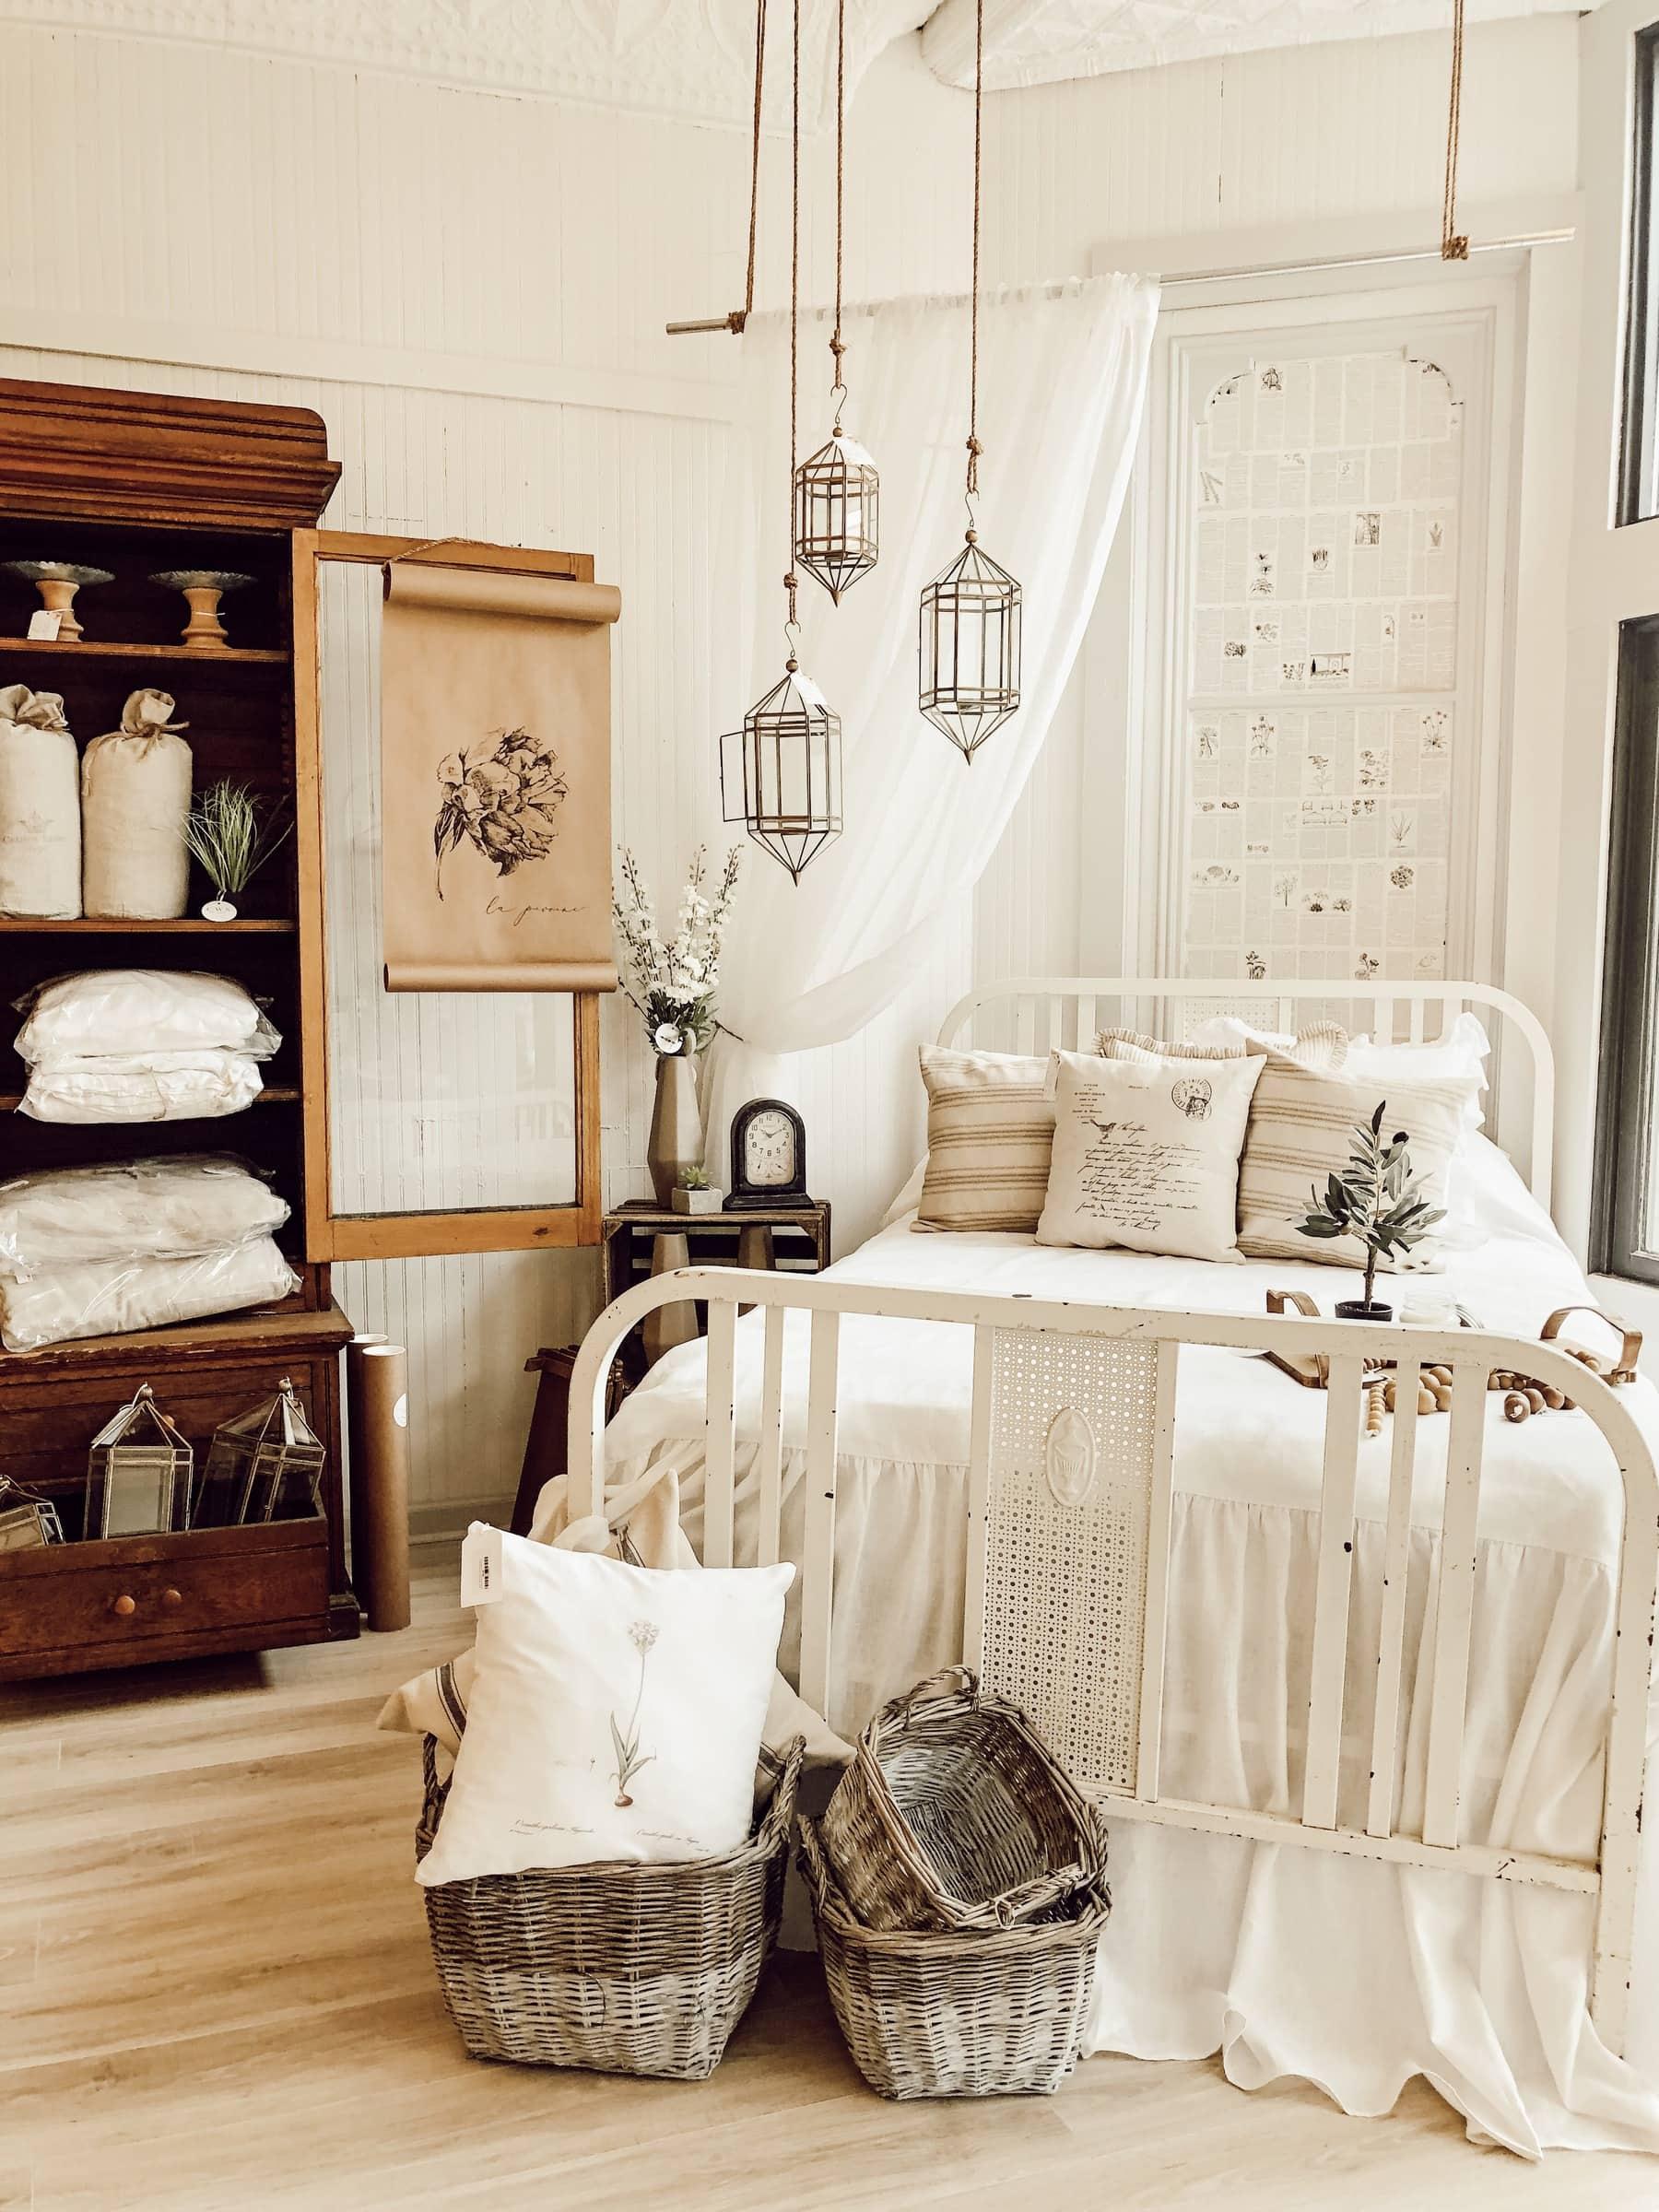 Small Shop Love – CottonWood Shanty